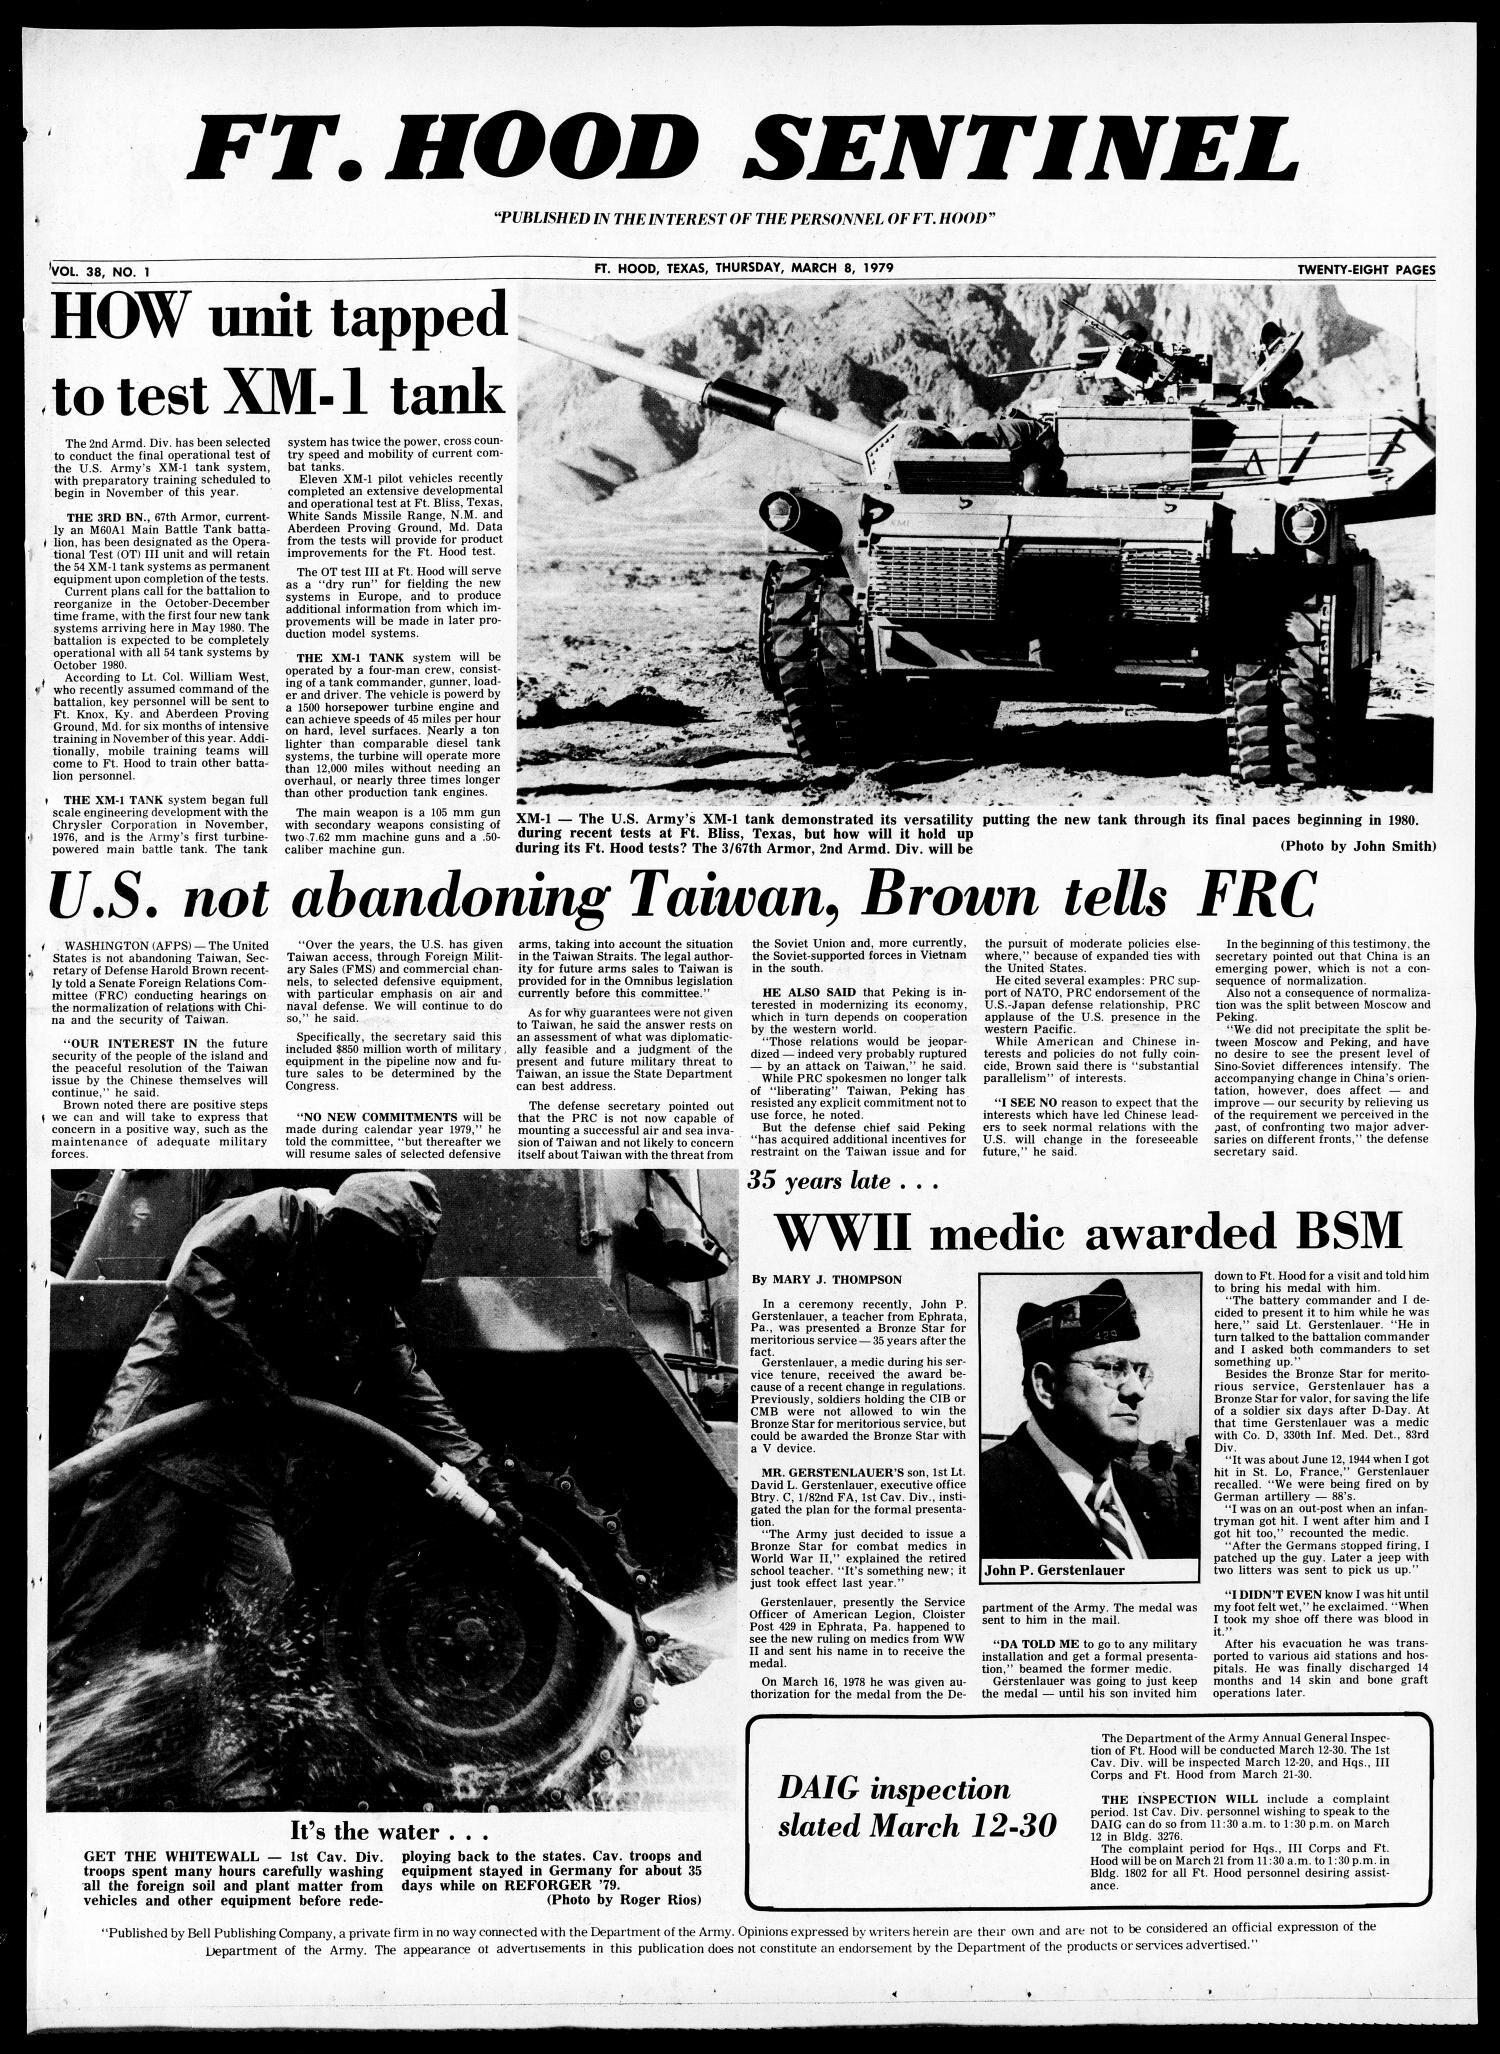 FT. HOOD SENTINEL_8 MAR 1979.jpg